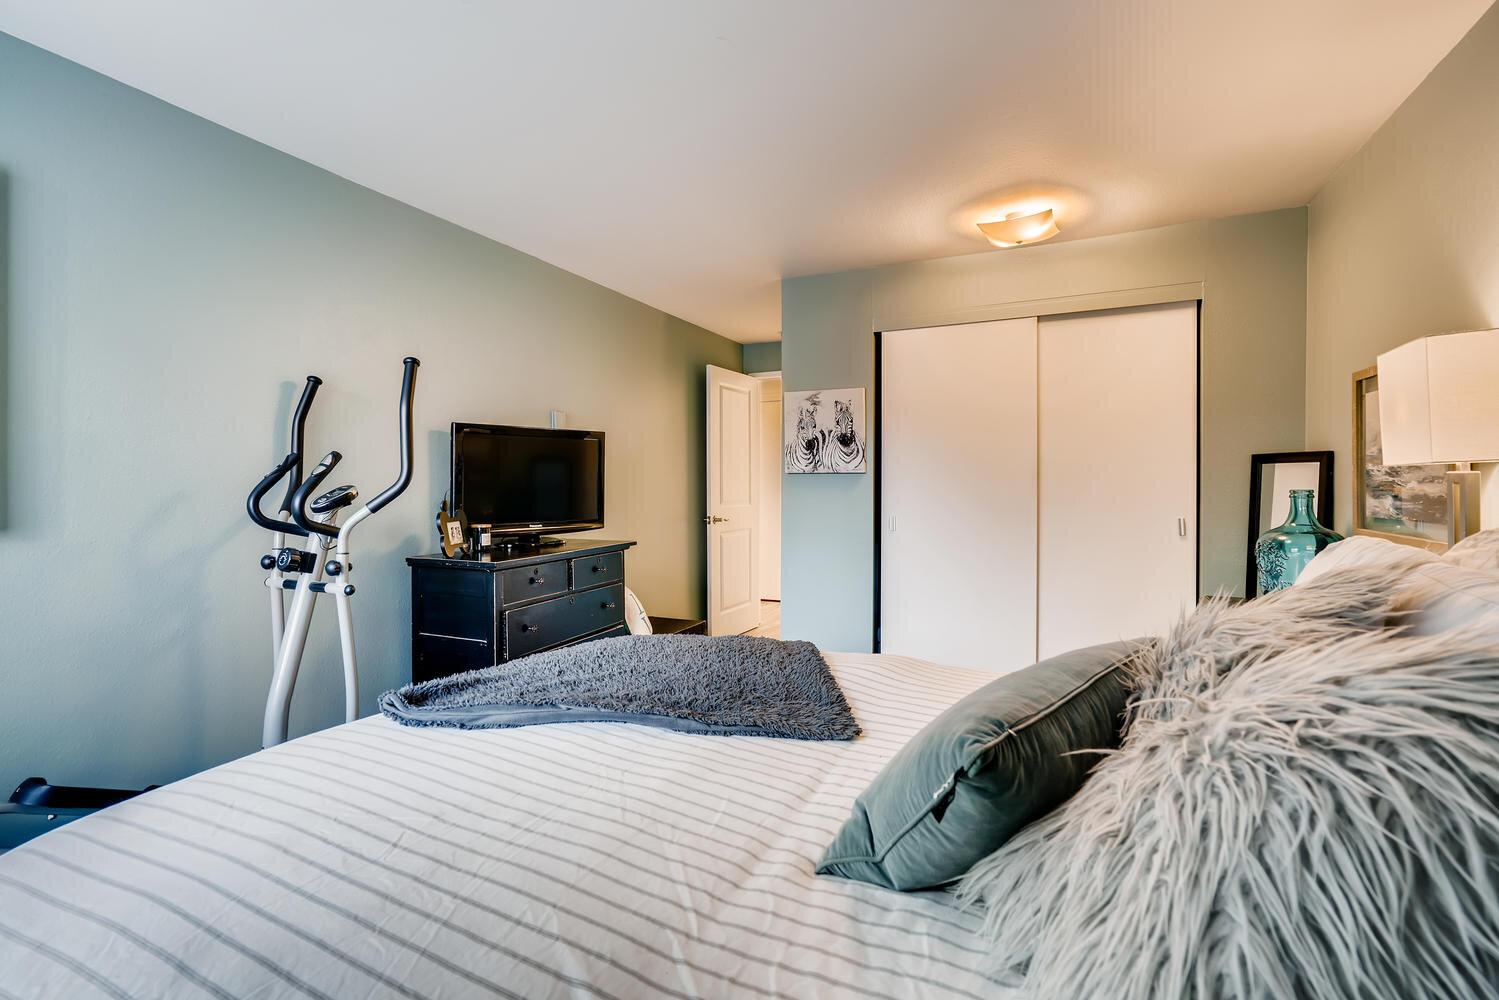 7021 Sand Point Way  B210-large-016-018-Master Bedroom-1499x1000-72dpi.jpg